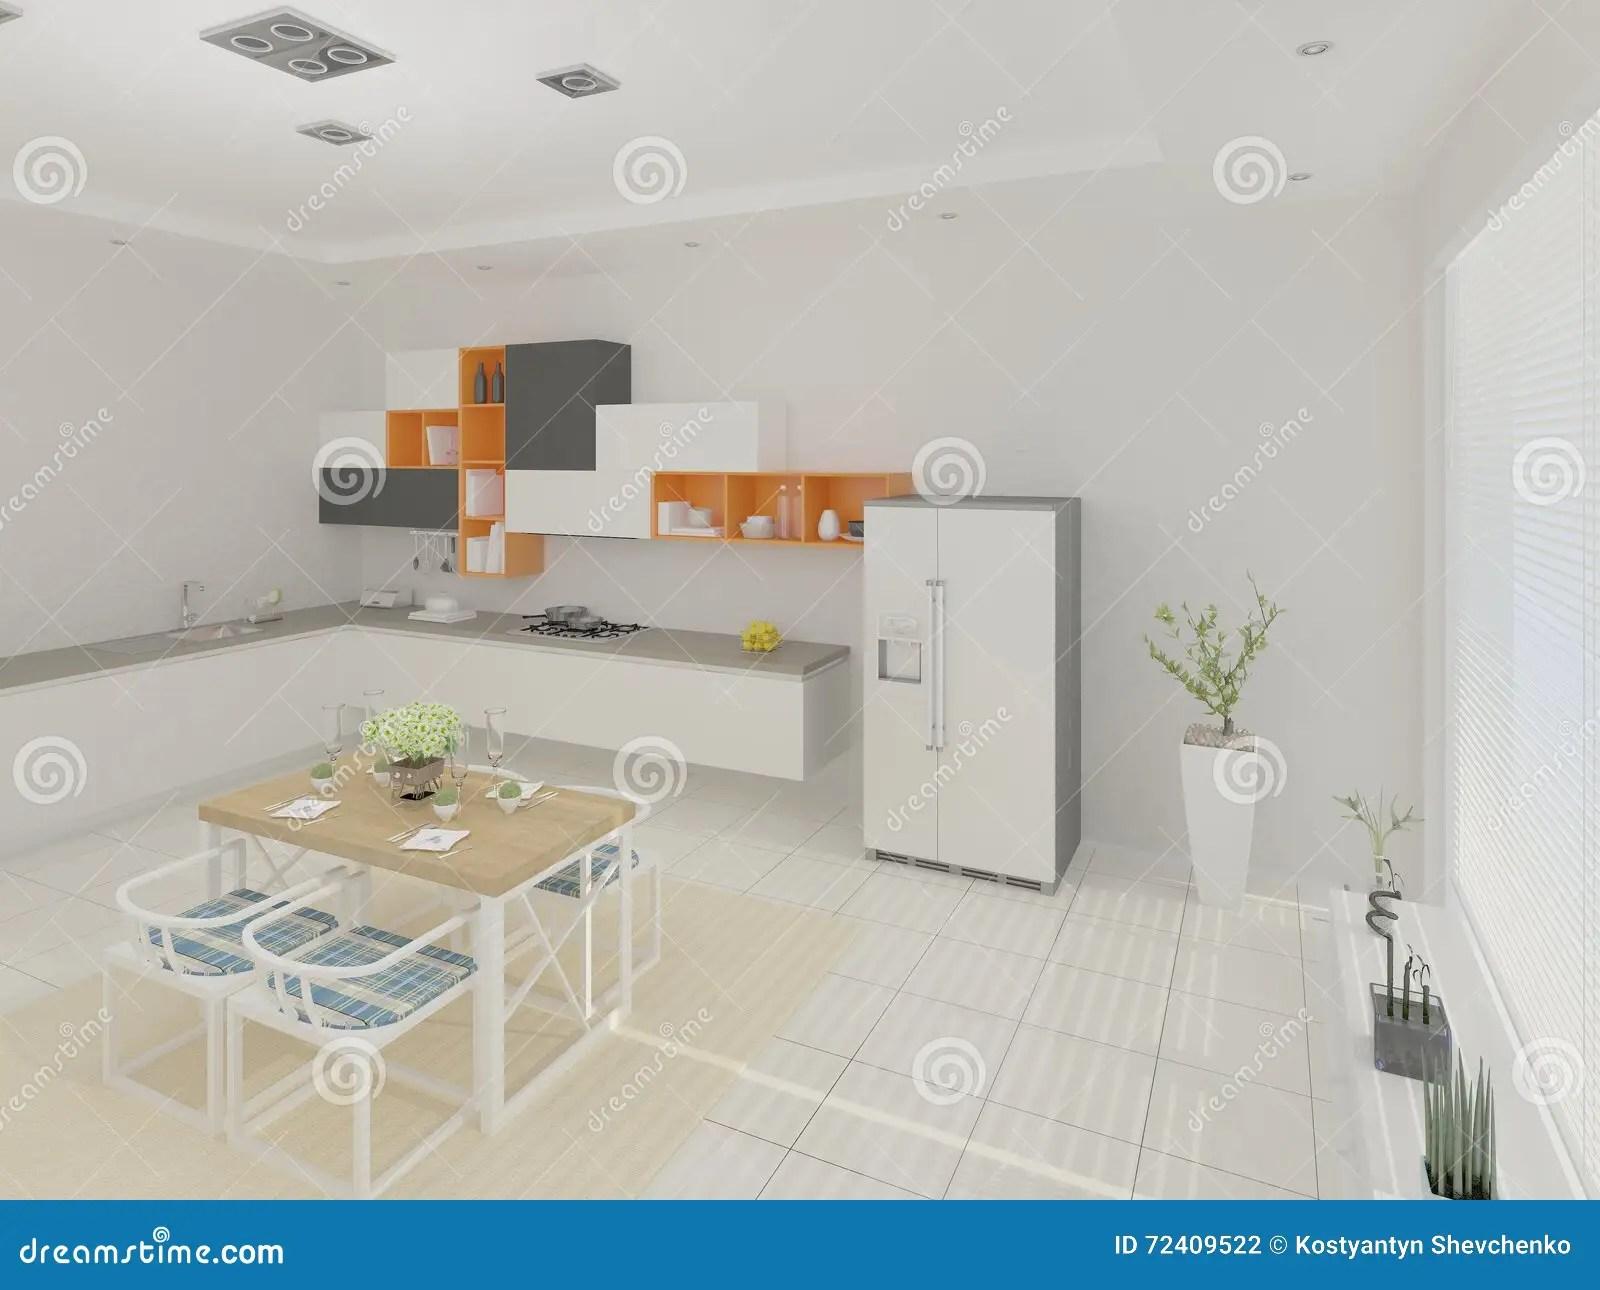 redesigning a kitchen soup volunteer denver 设计一个宽敞厨房图库摄影片 插画包括有椅子 橙色 内部 系列 空间 设计一个宽敞厨房